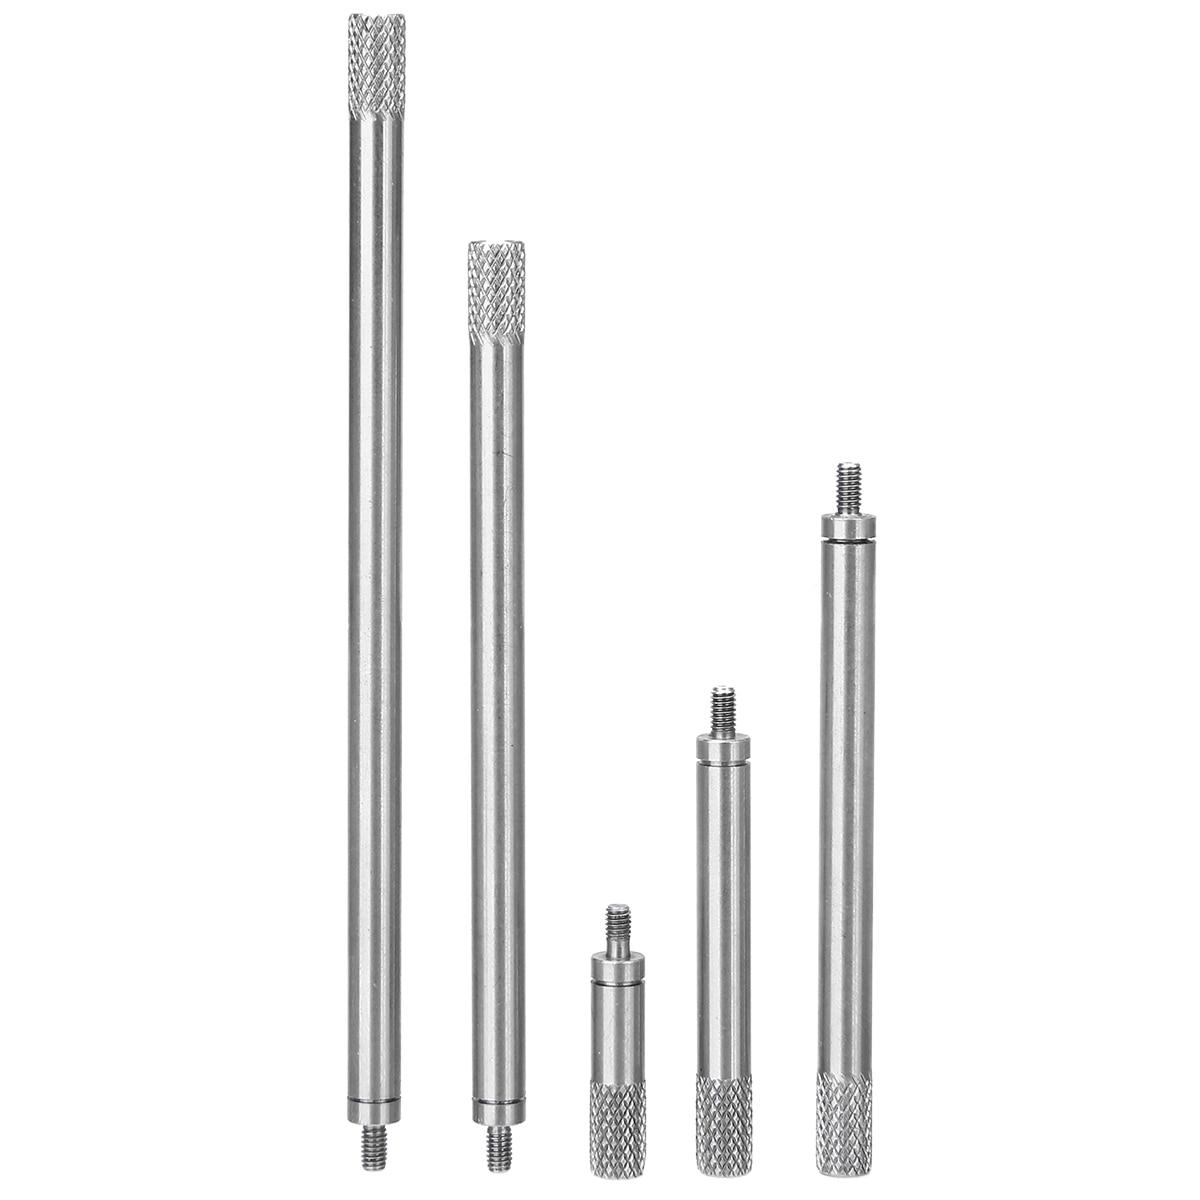 5pcs Dial Digital Indicator HSS Dia 5mm Indicator Dial Rod Extension Stem Rod Set M2.5 20 40 60 80 100mm Electrical Equipments